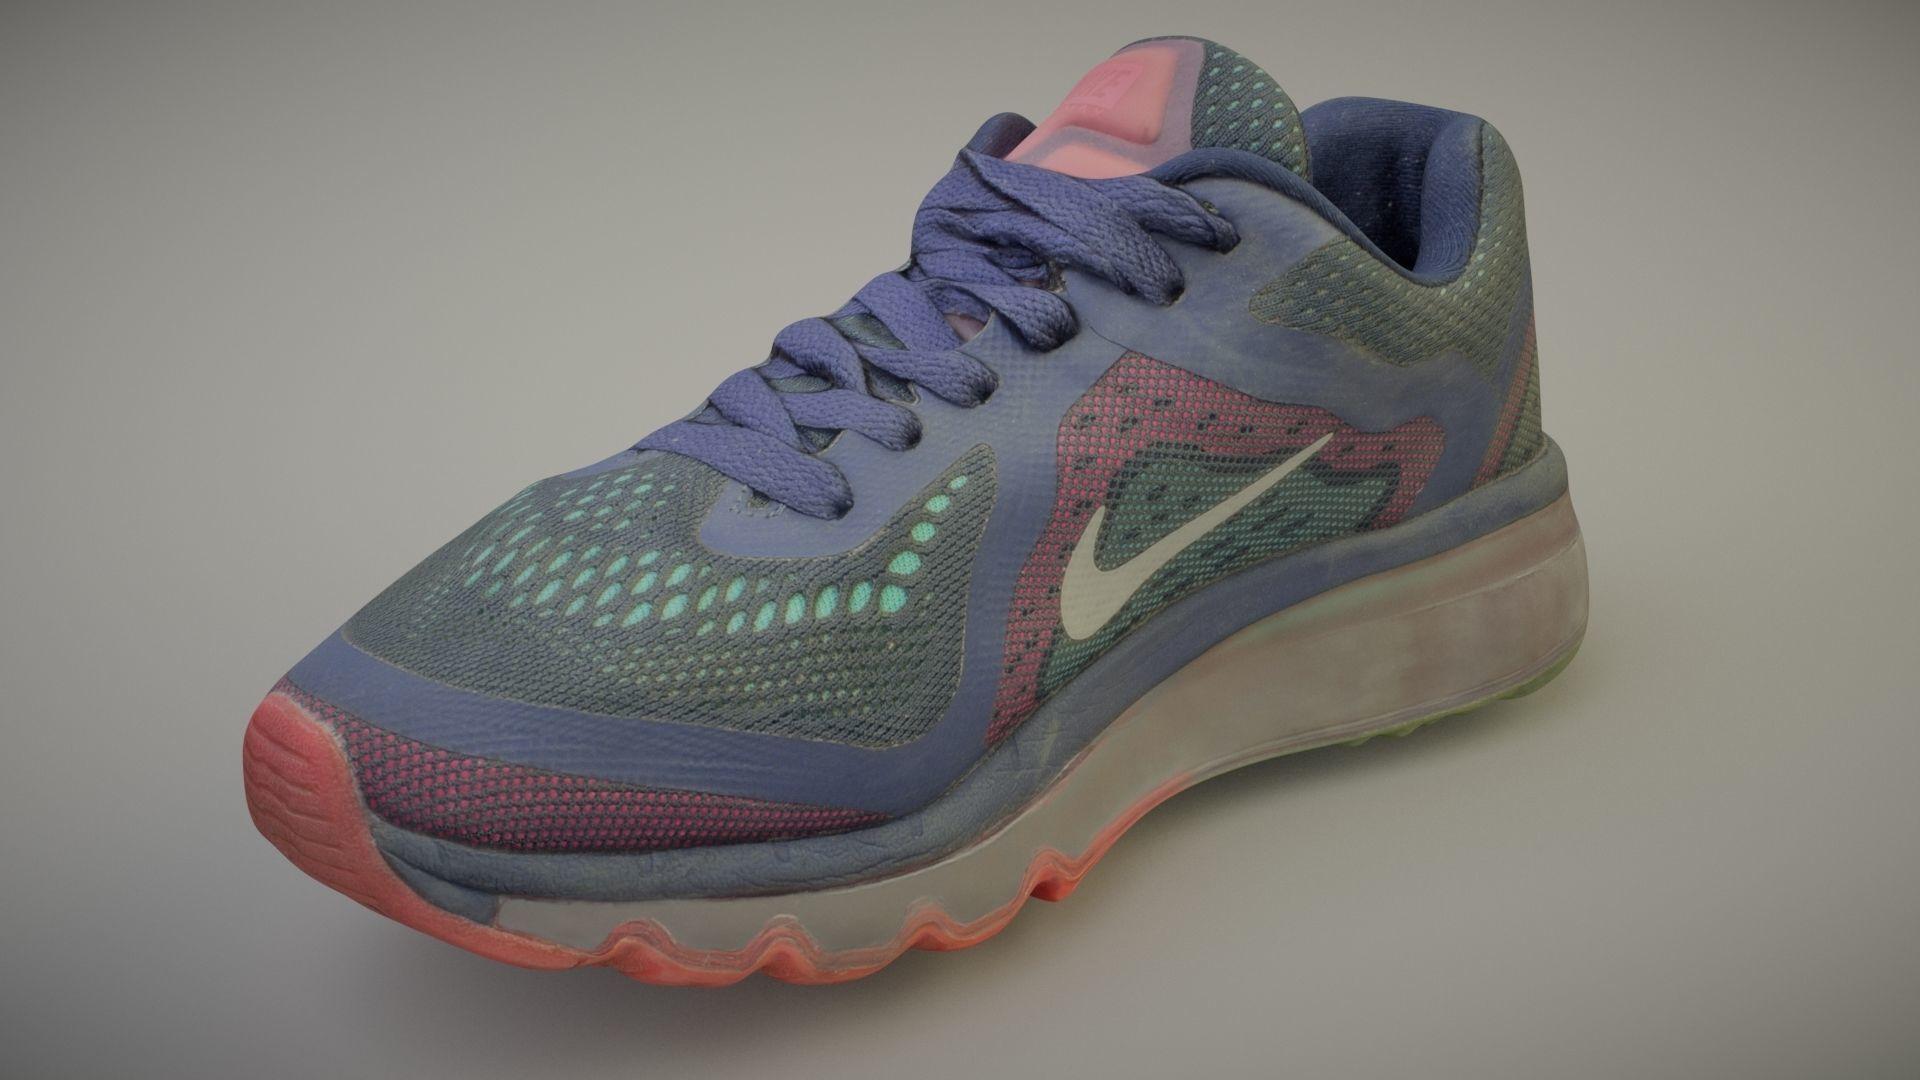 Worn Nike Air shoe low poly 3D model